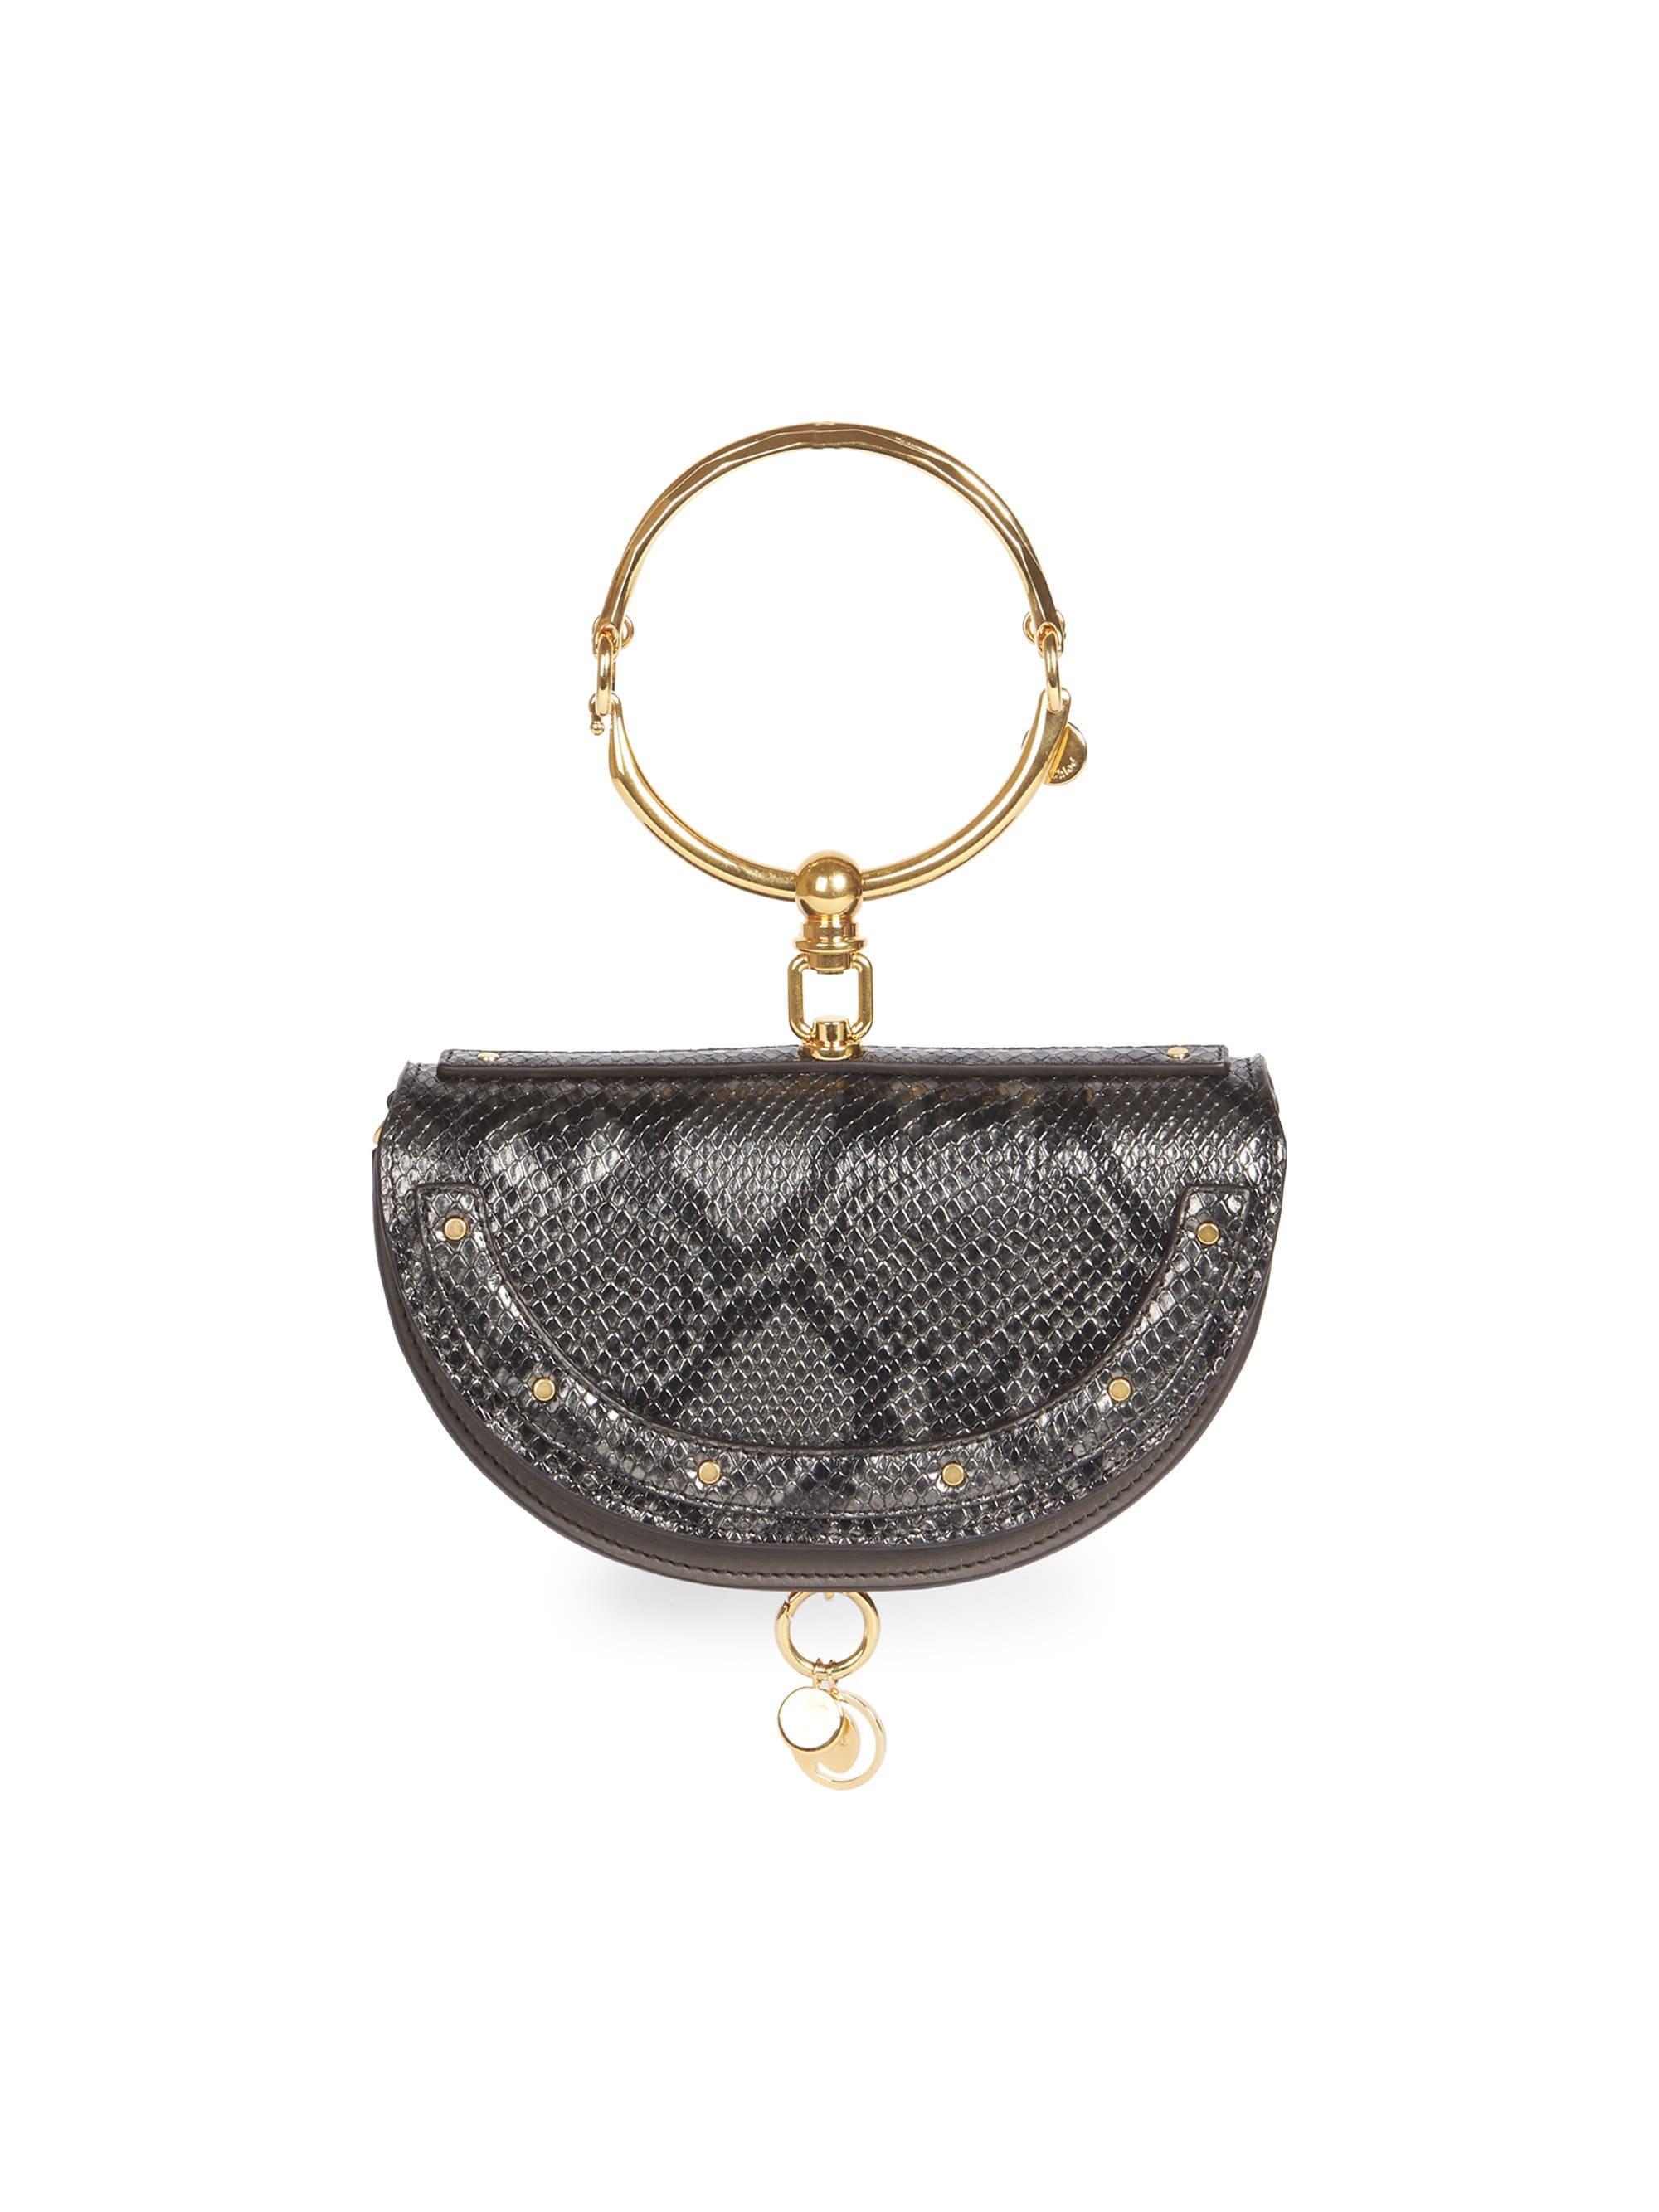 Lyst - Chloé Women s Nile Half Moon Python-print Leather Minaudiere f3b3b6f5203ab